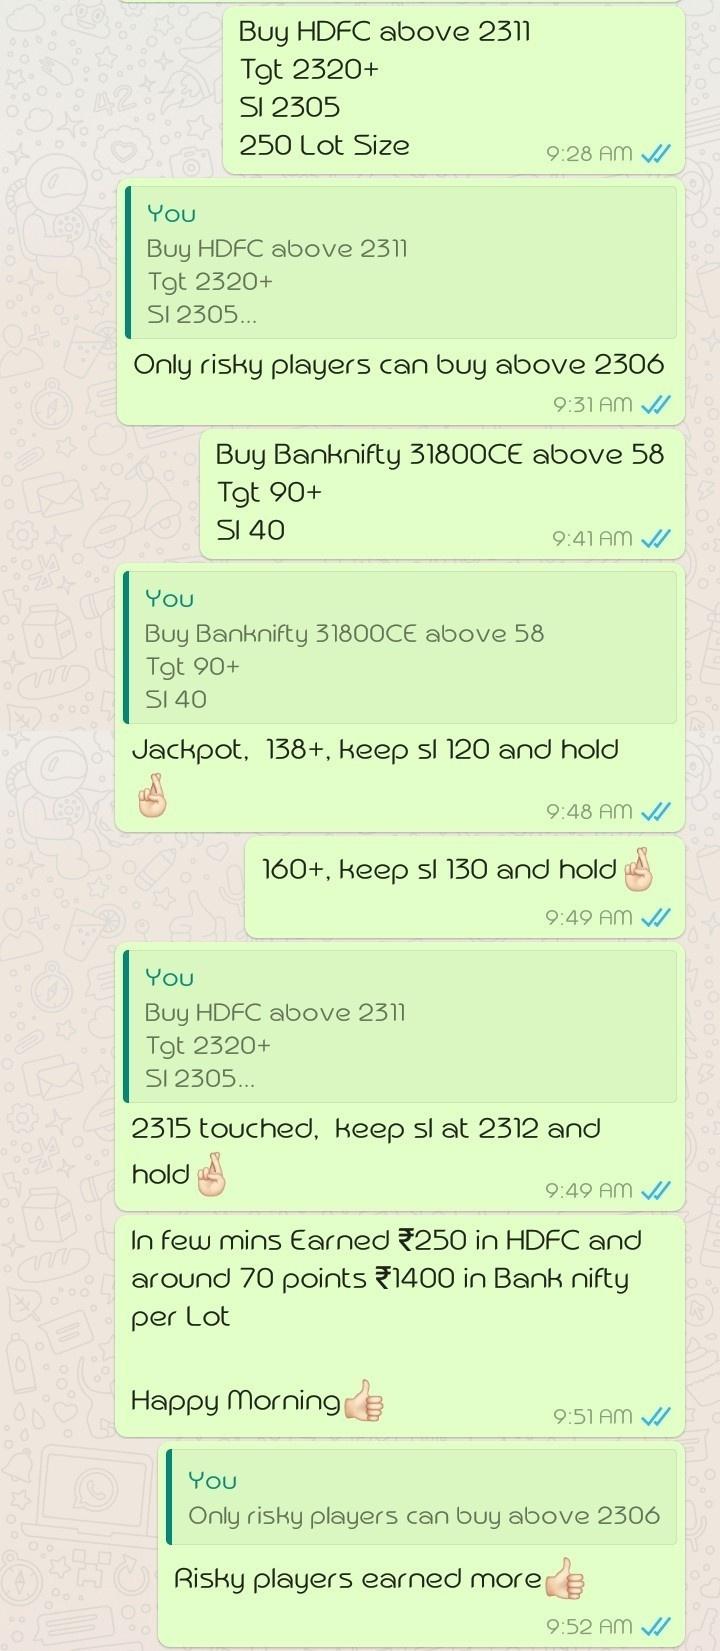 @trader-r1jKQChOE's activity - 466047